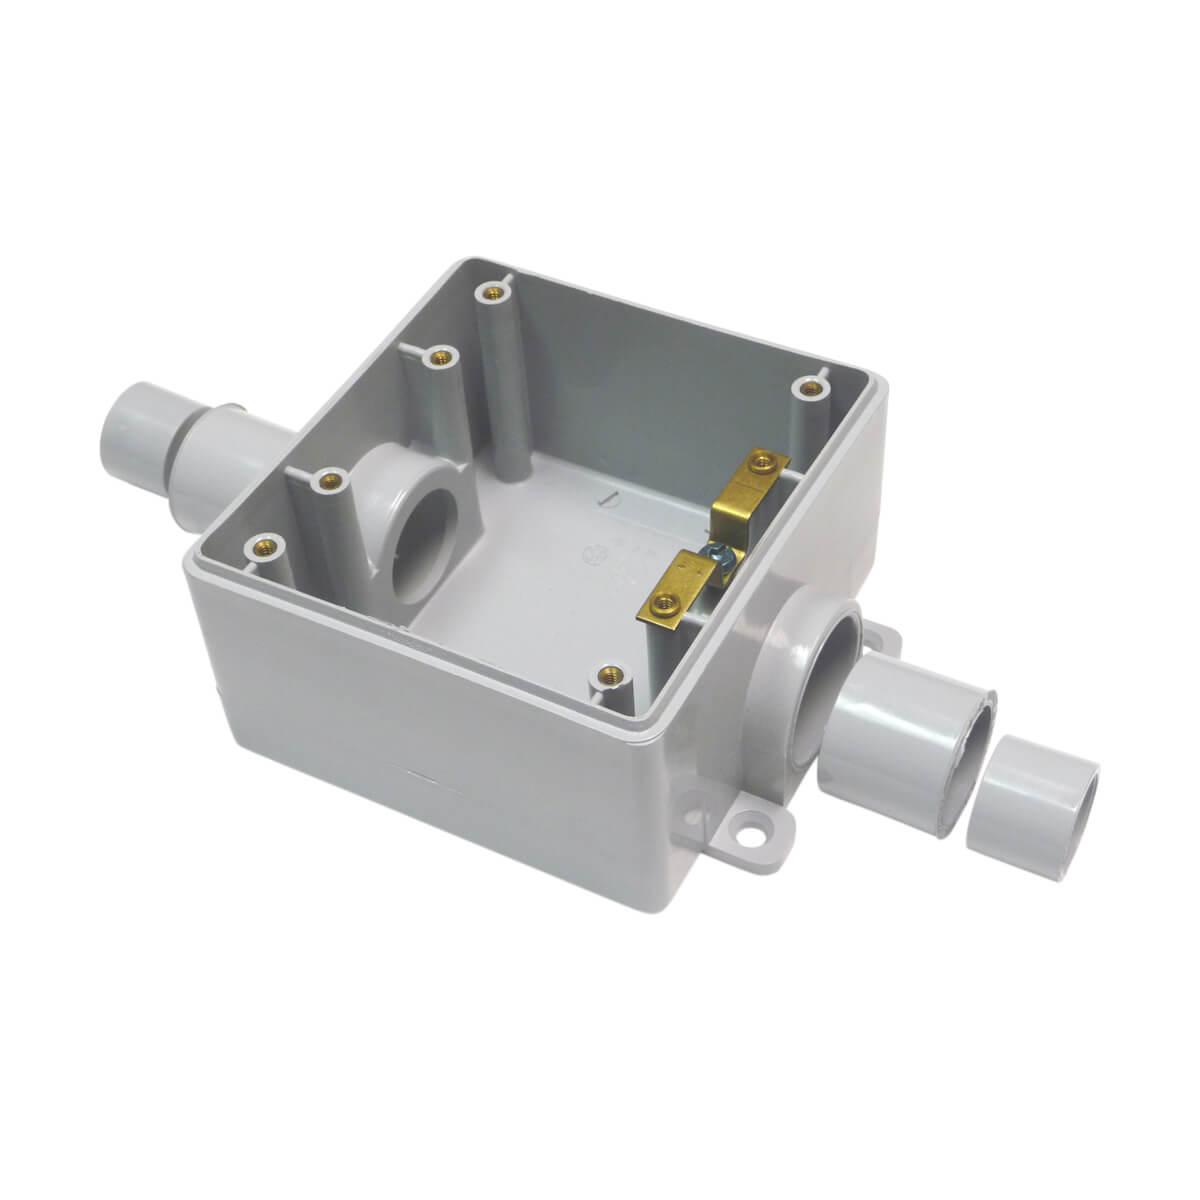 "PVC FSC 3-in-1 Double Gang Box (with reducer bushings) - Hub - 1/2"" - 3/4"" - 1"""